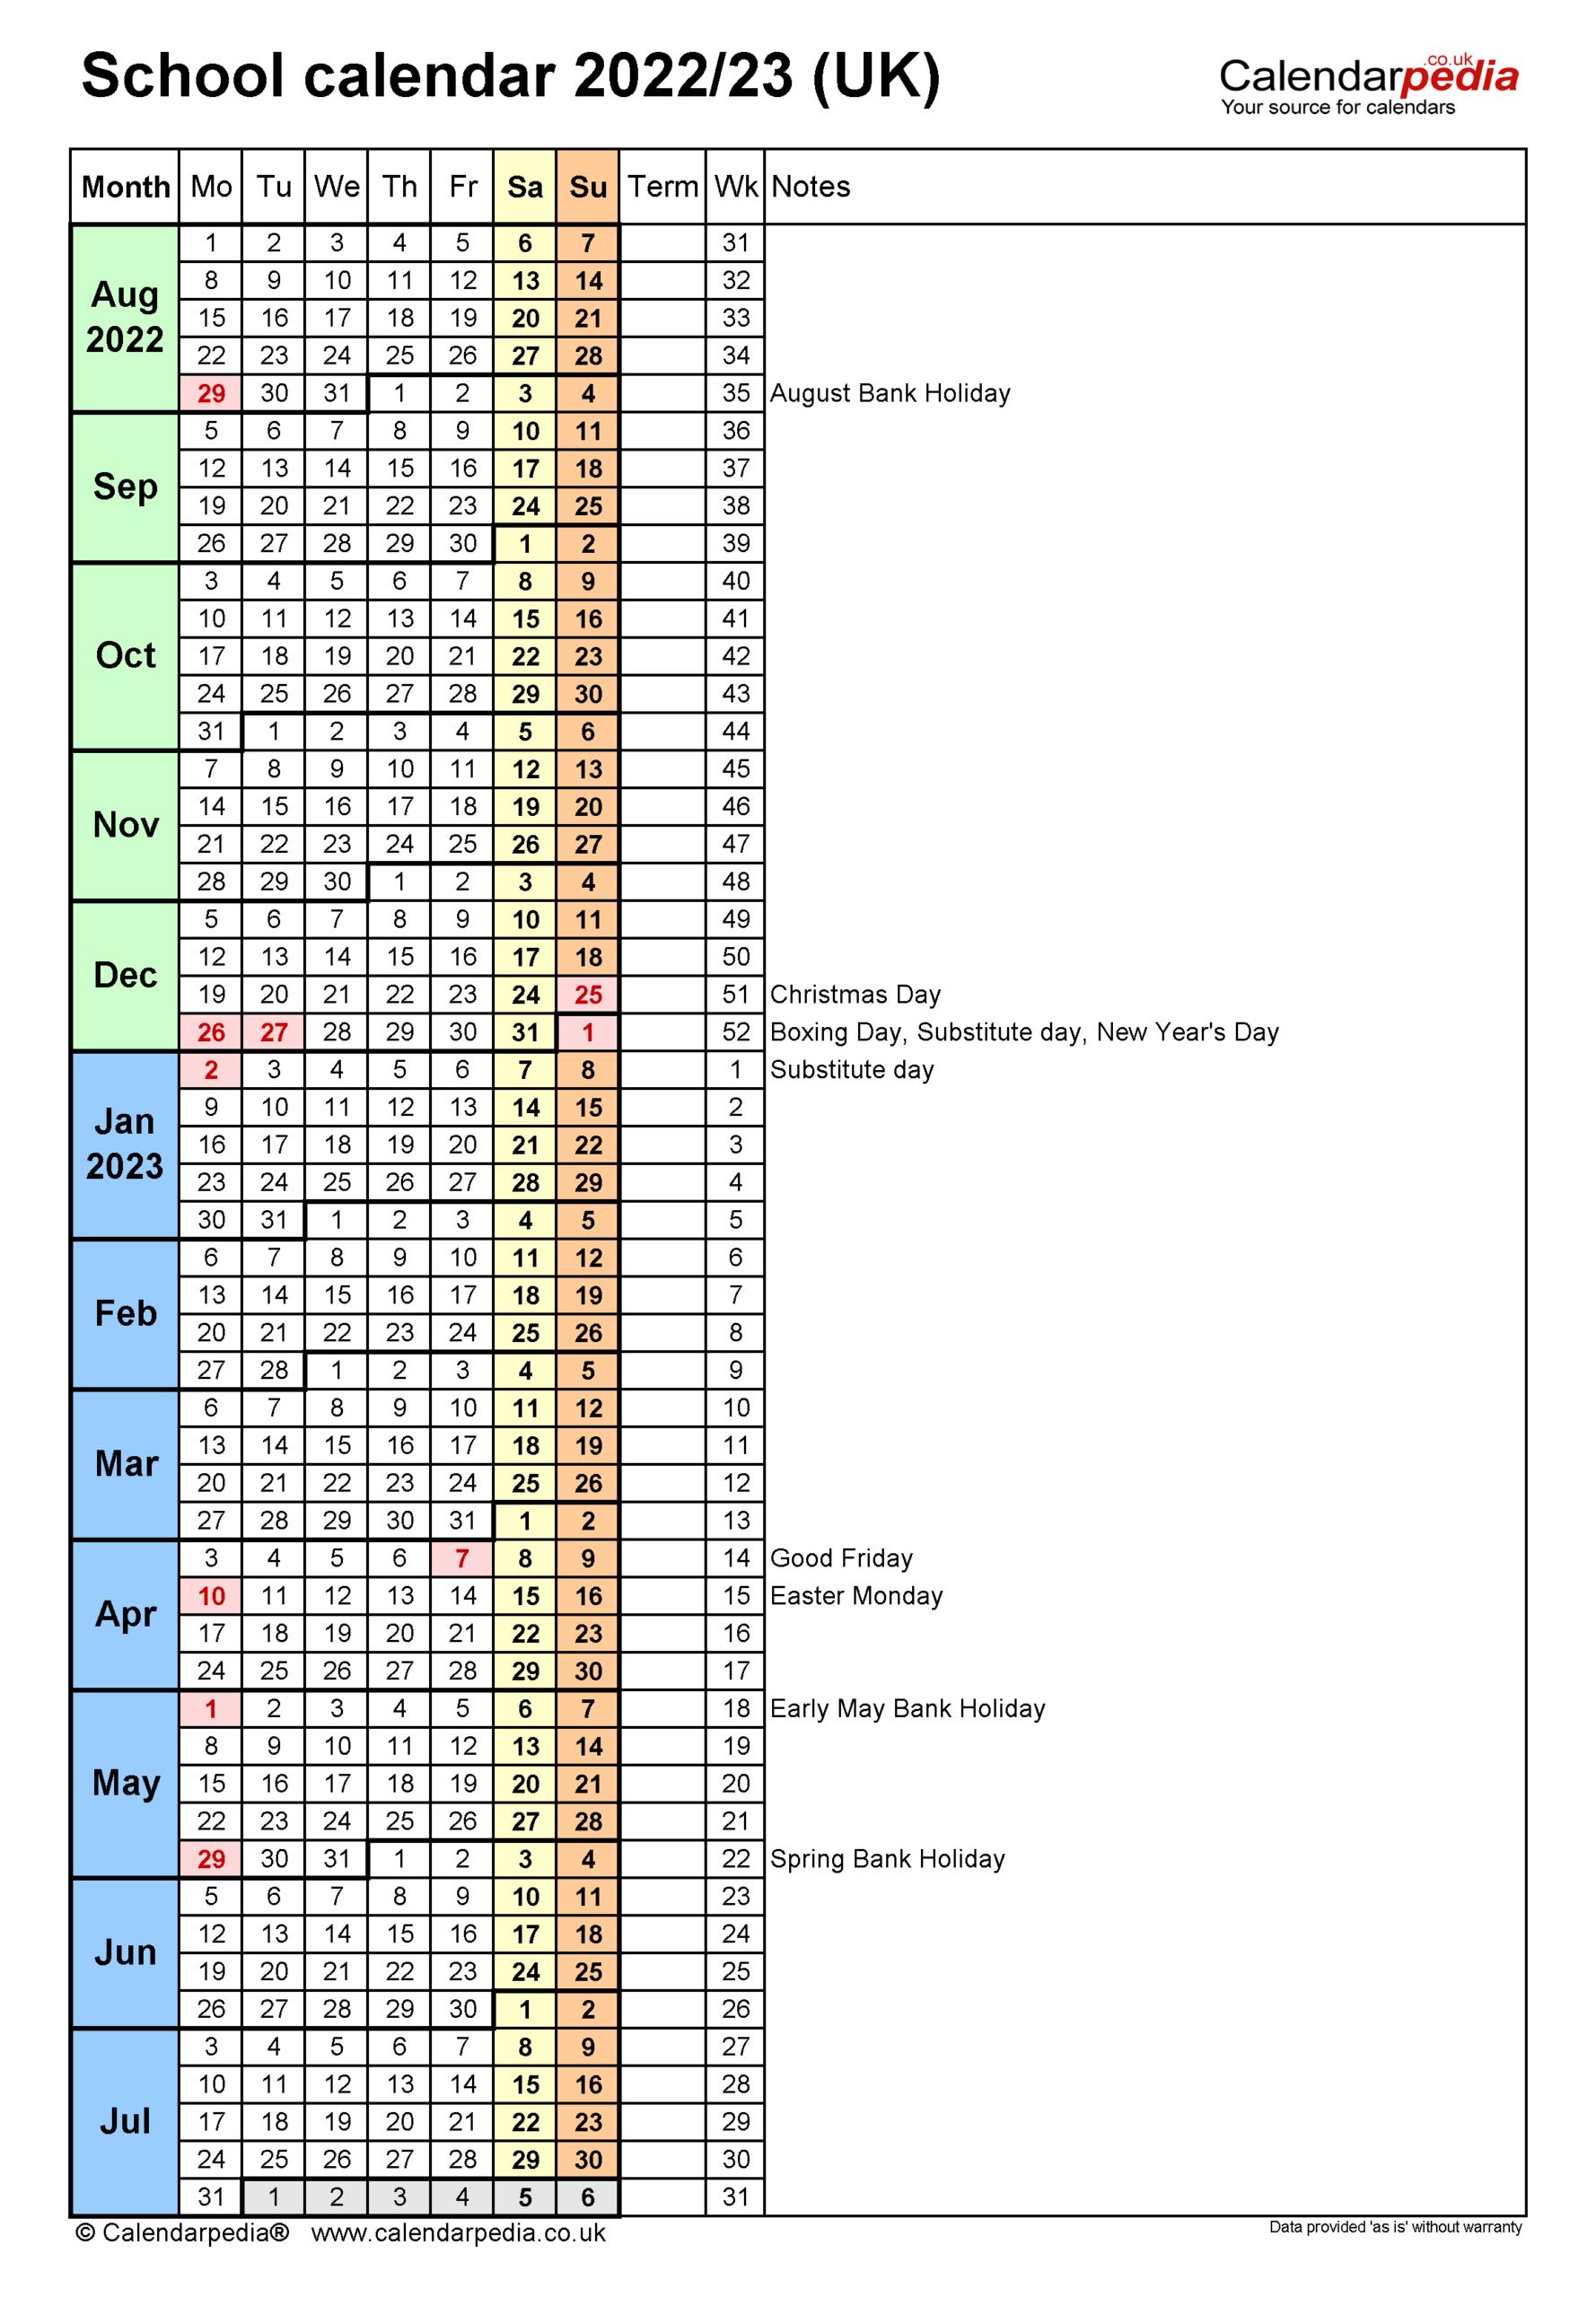 School Calendars 2022/2023 As Free Printable Pdf Templates regarding Aiken County 2022 2023 School Calendar